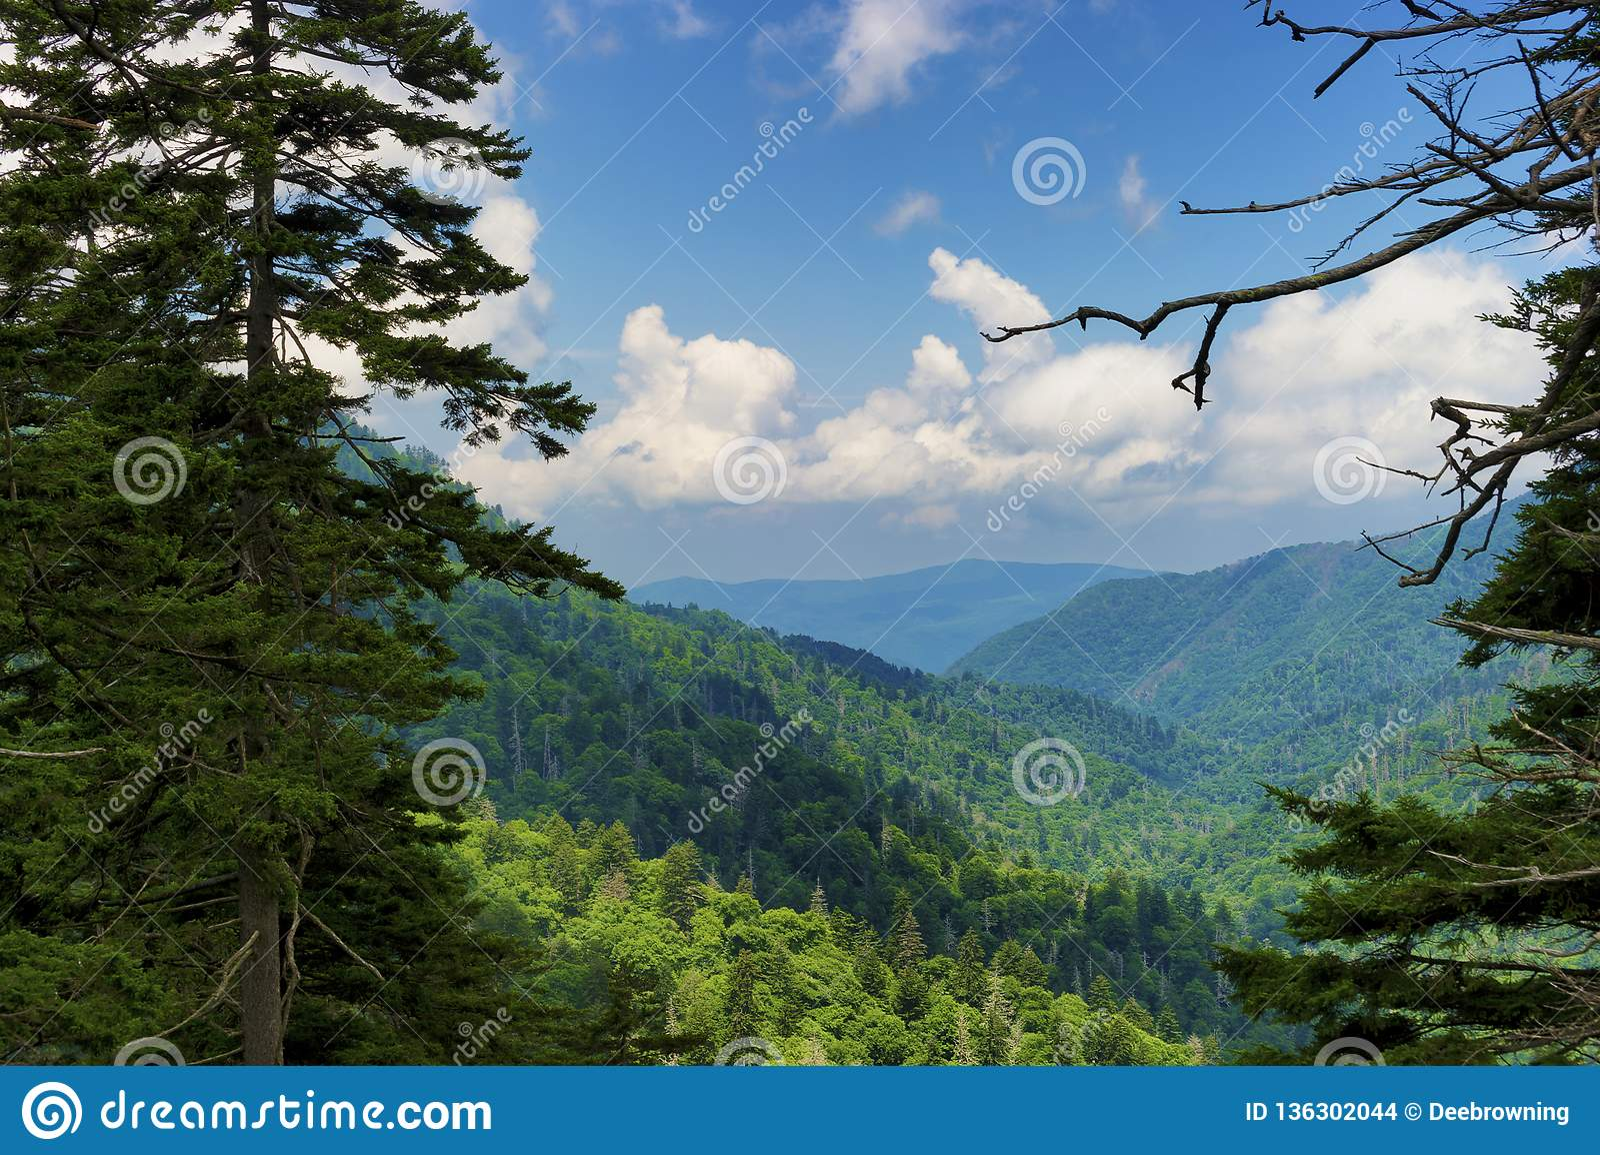 Parque nacional de Great Smoky Mountains en verano